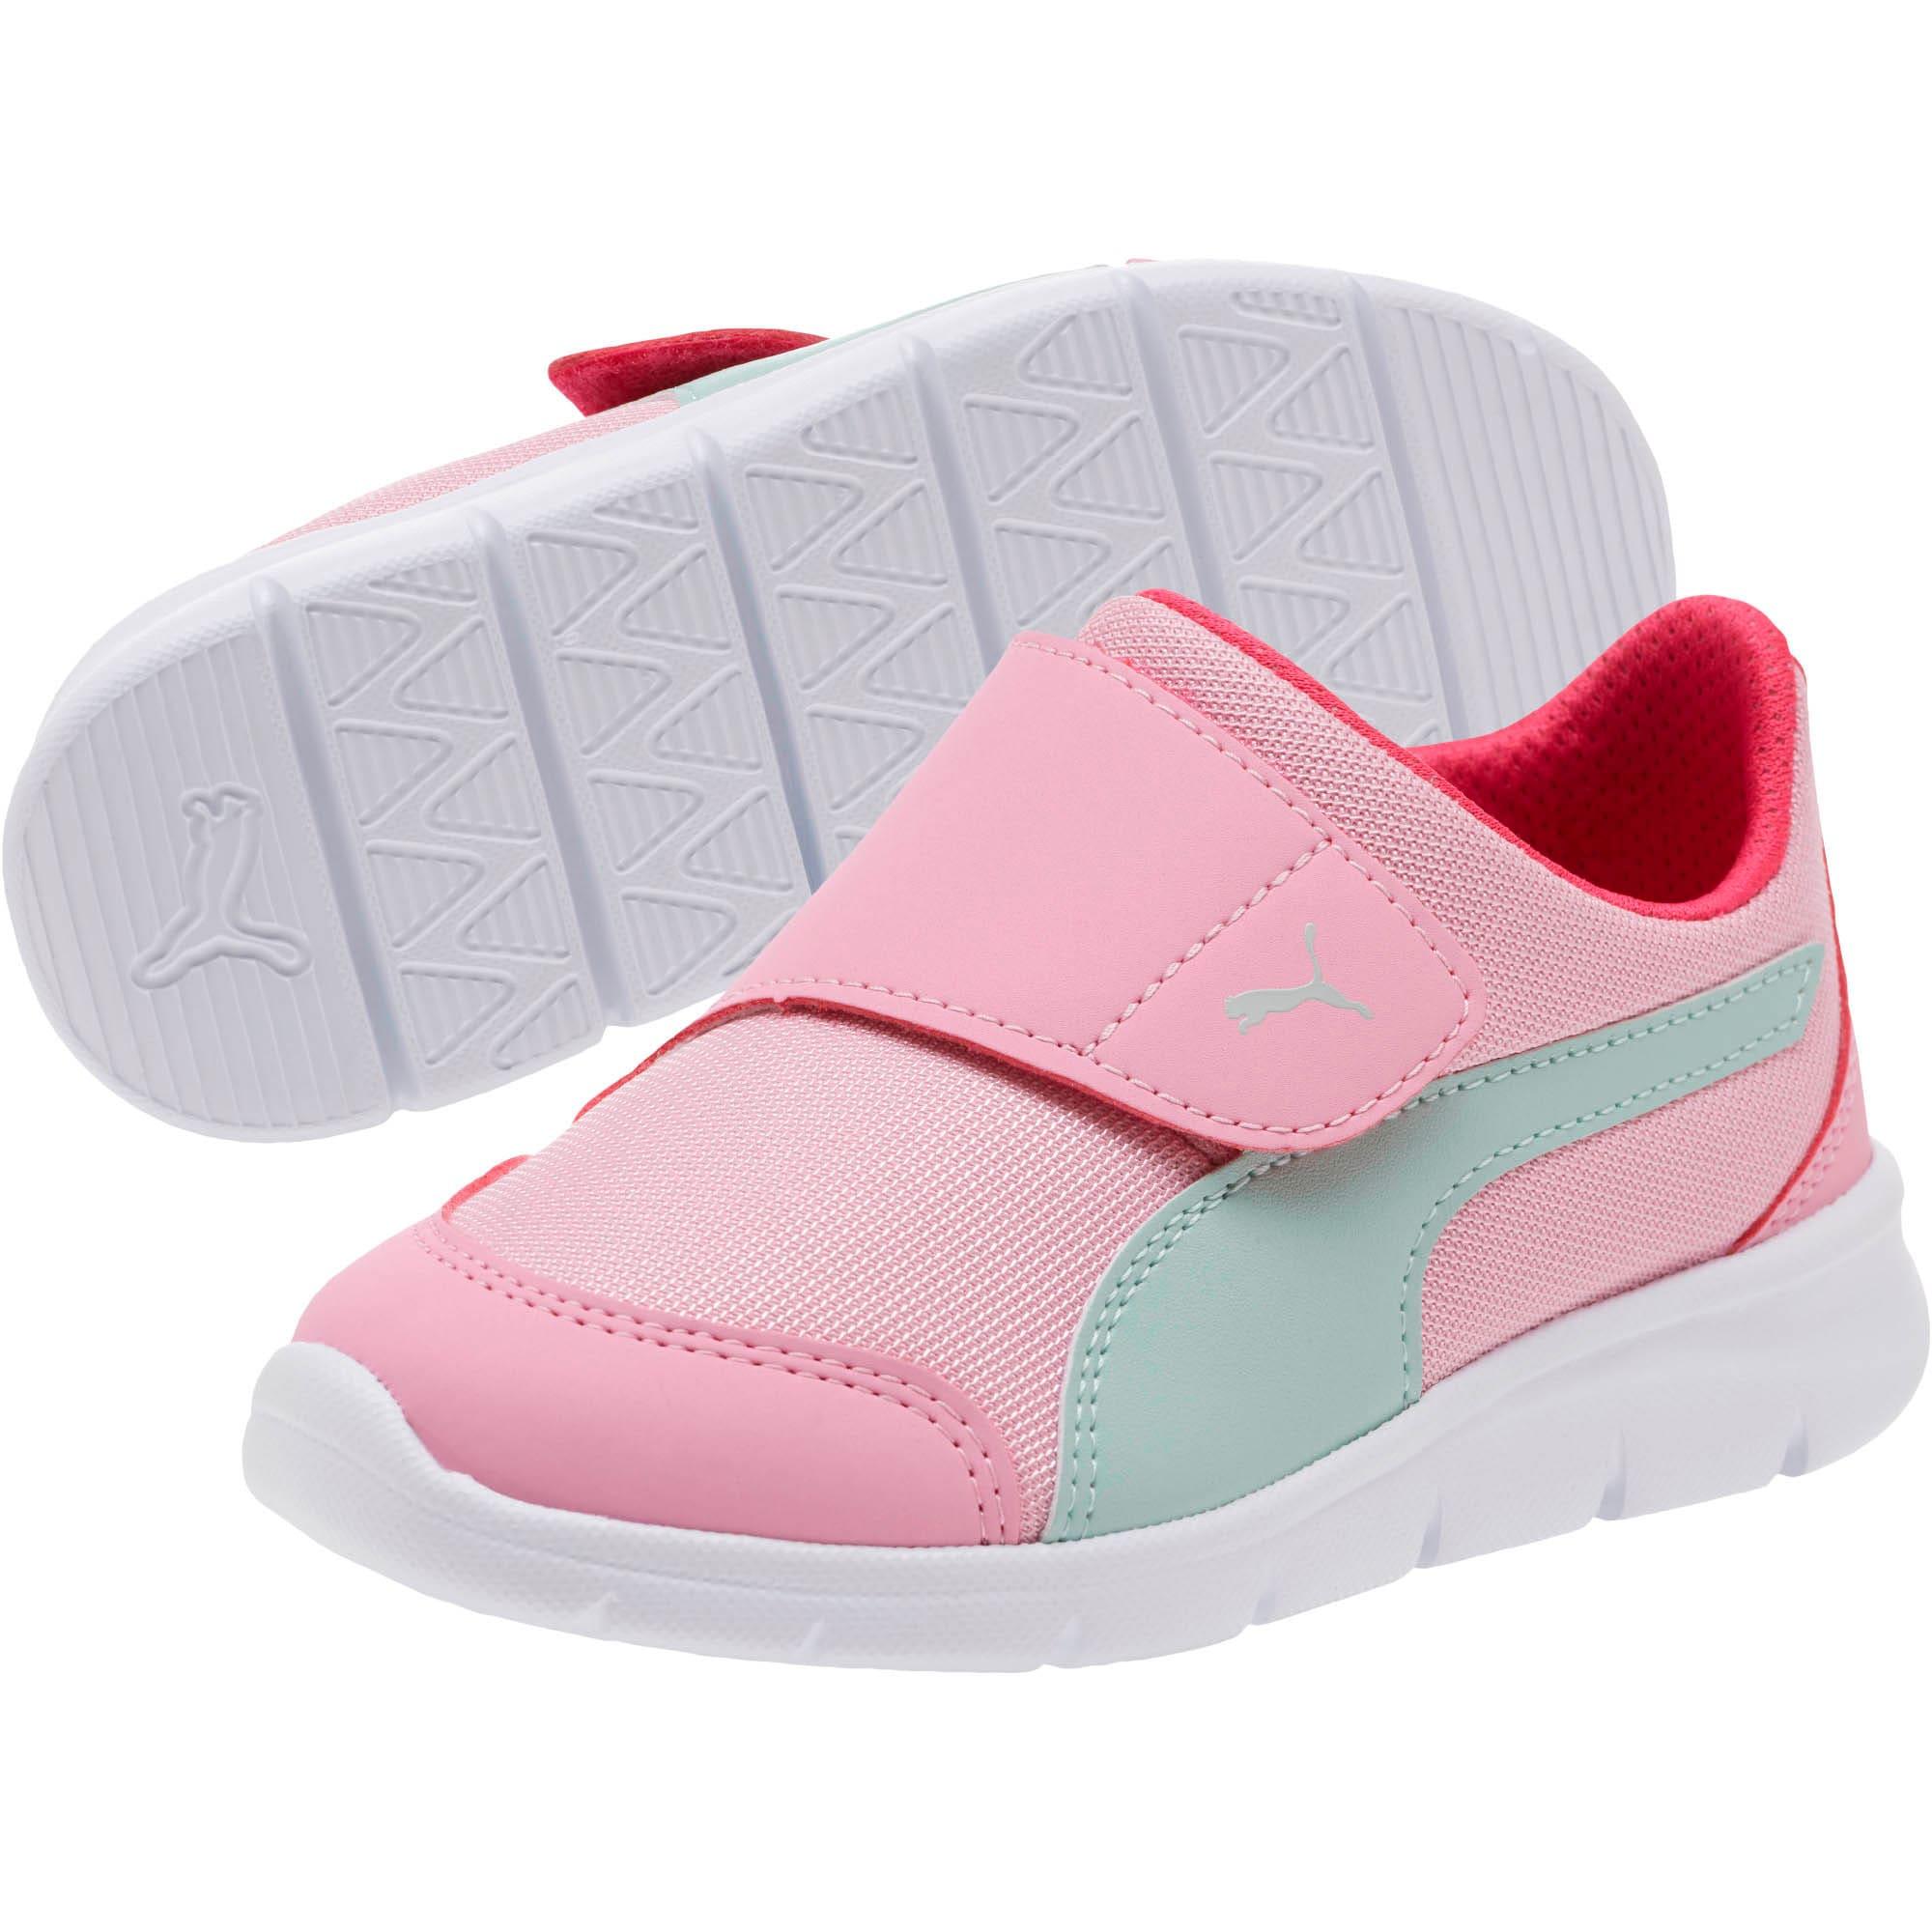 Thumbnail 2 of Bao 3 AC Little Kids' Shoes, Pale Pink-Fair Aqua-Purple, medium